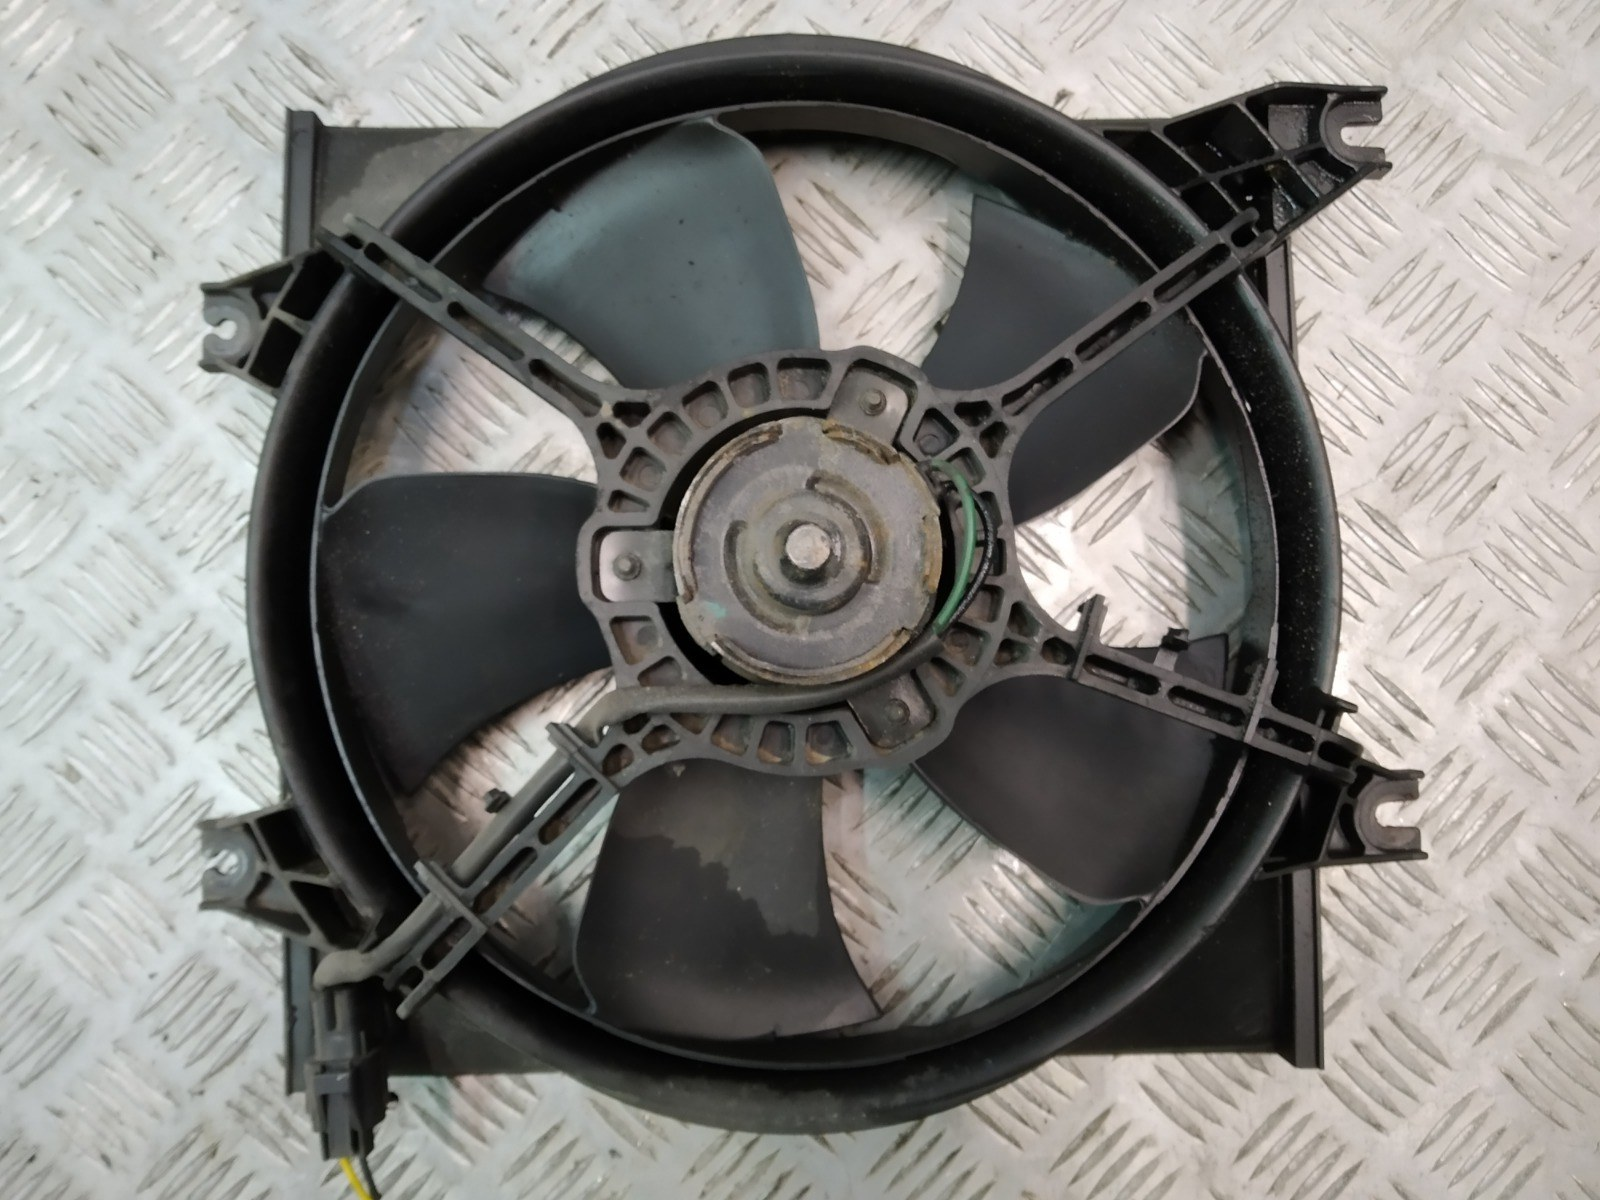 Вентилятор радиатора Hyundai Accent LC 1.5 I 2000 (б/у)